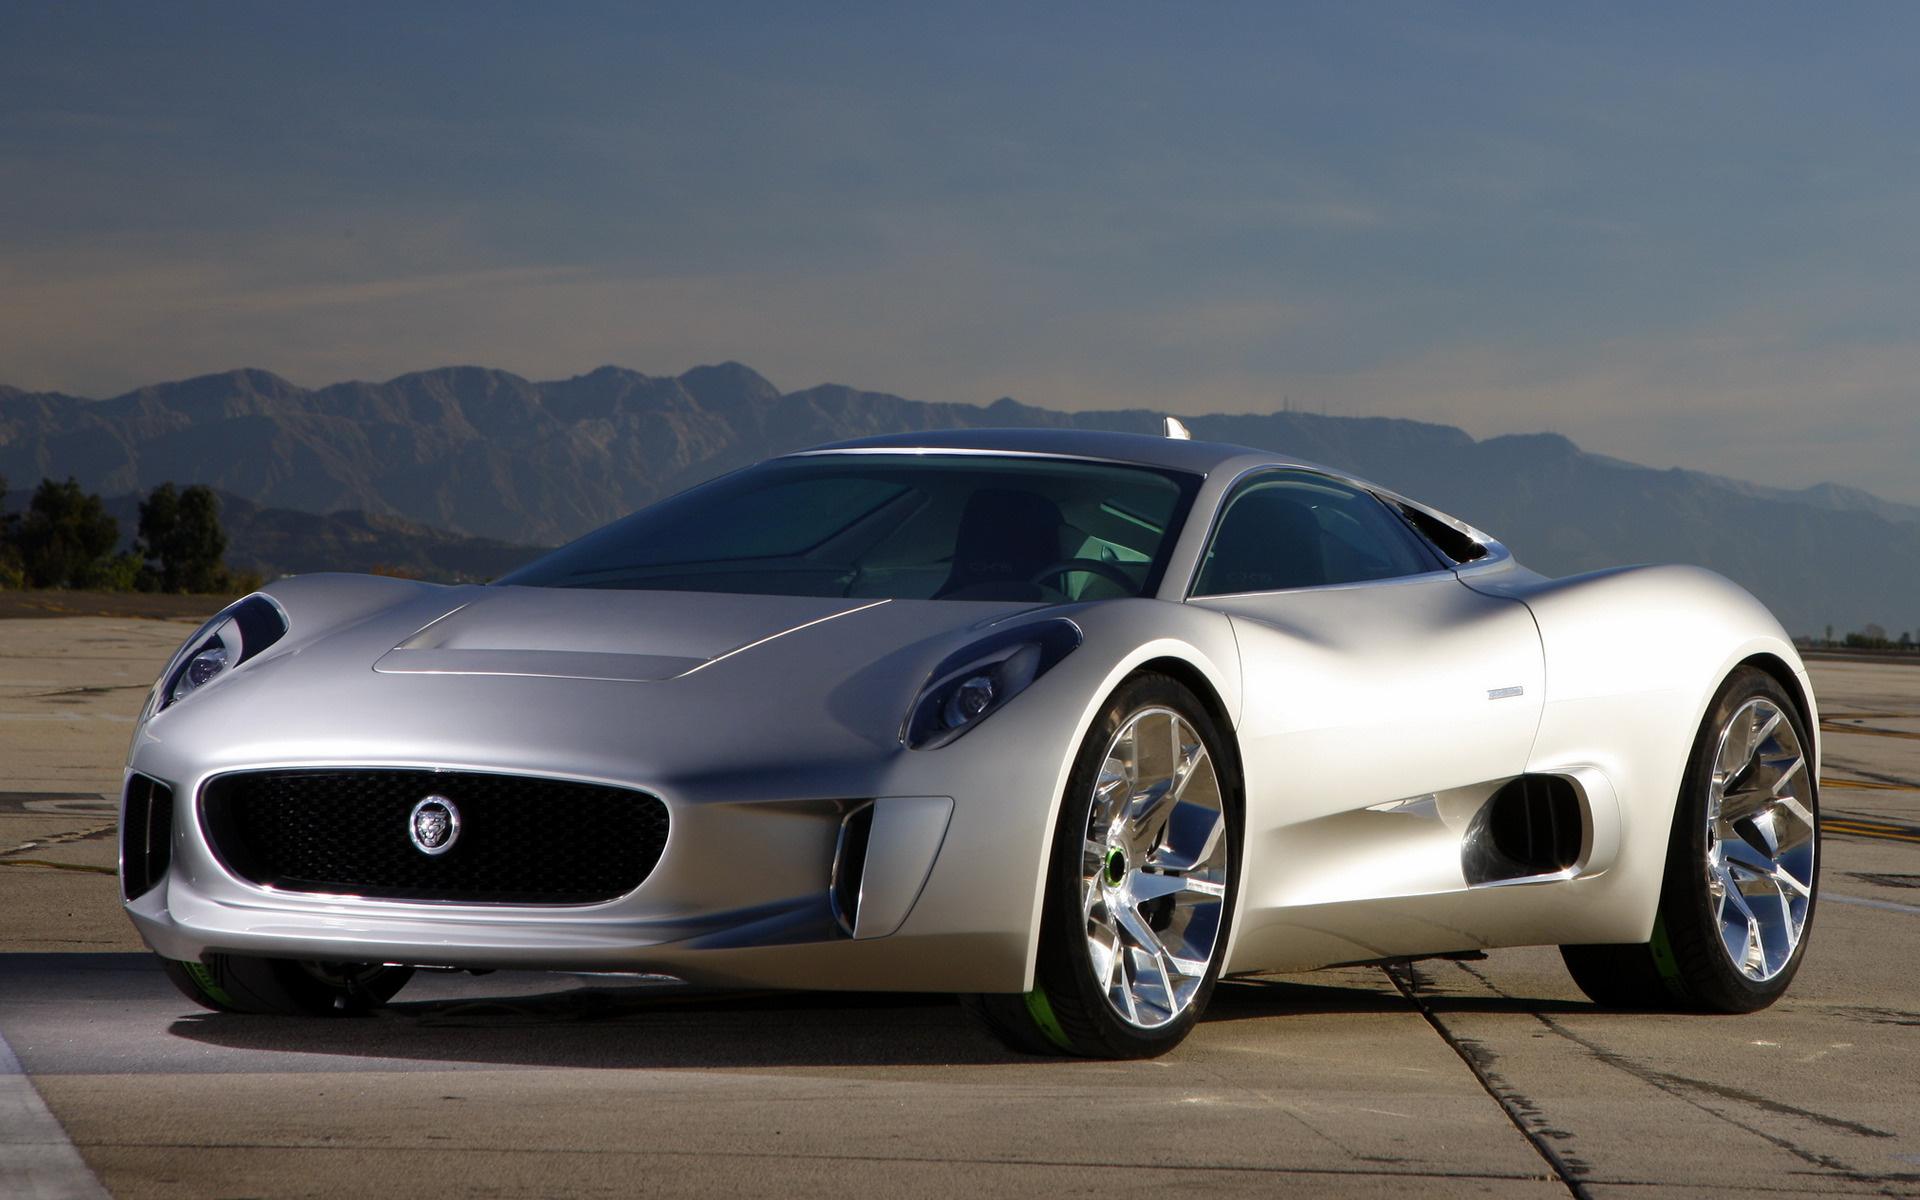 Jaguar C-X75 Concept (2010) Wallpapers and HD Images - Car Pixel